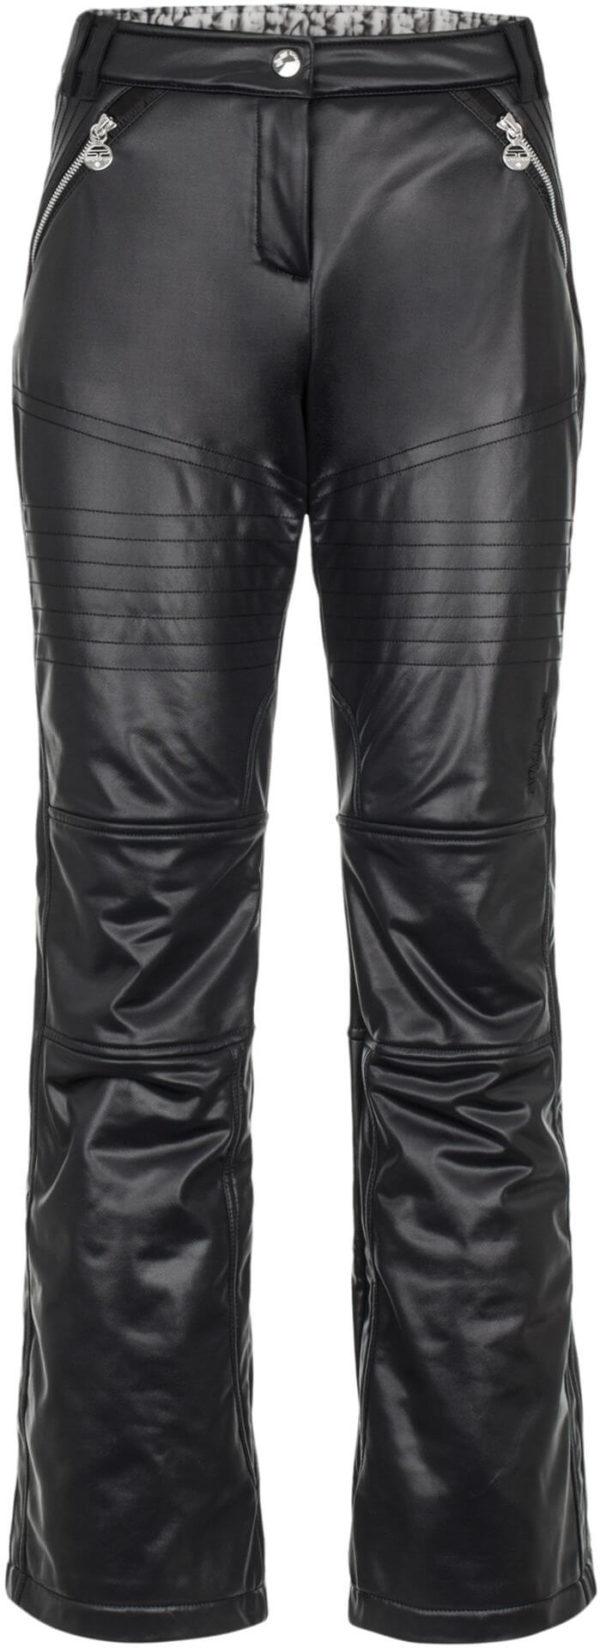 Женские брюки SAMI SN - фото 1